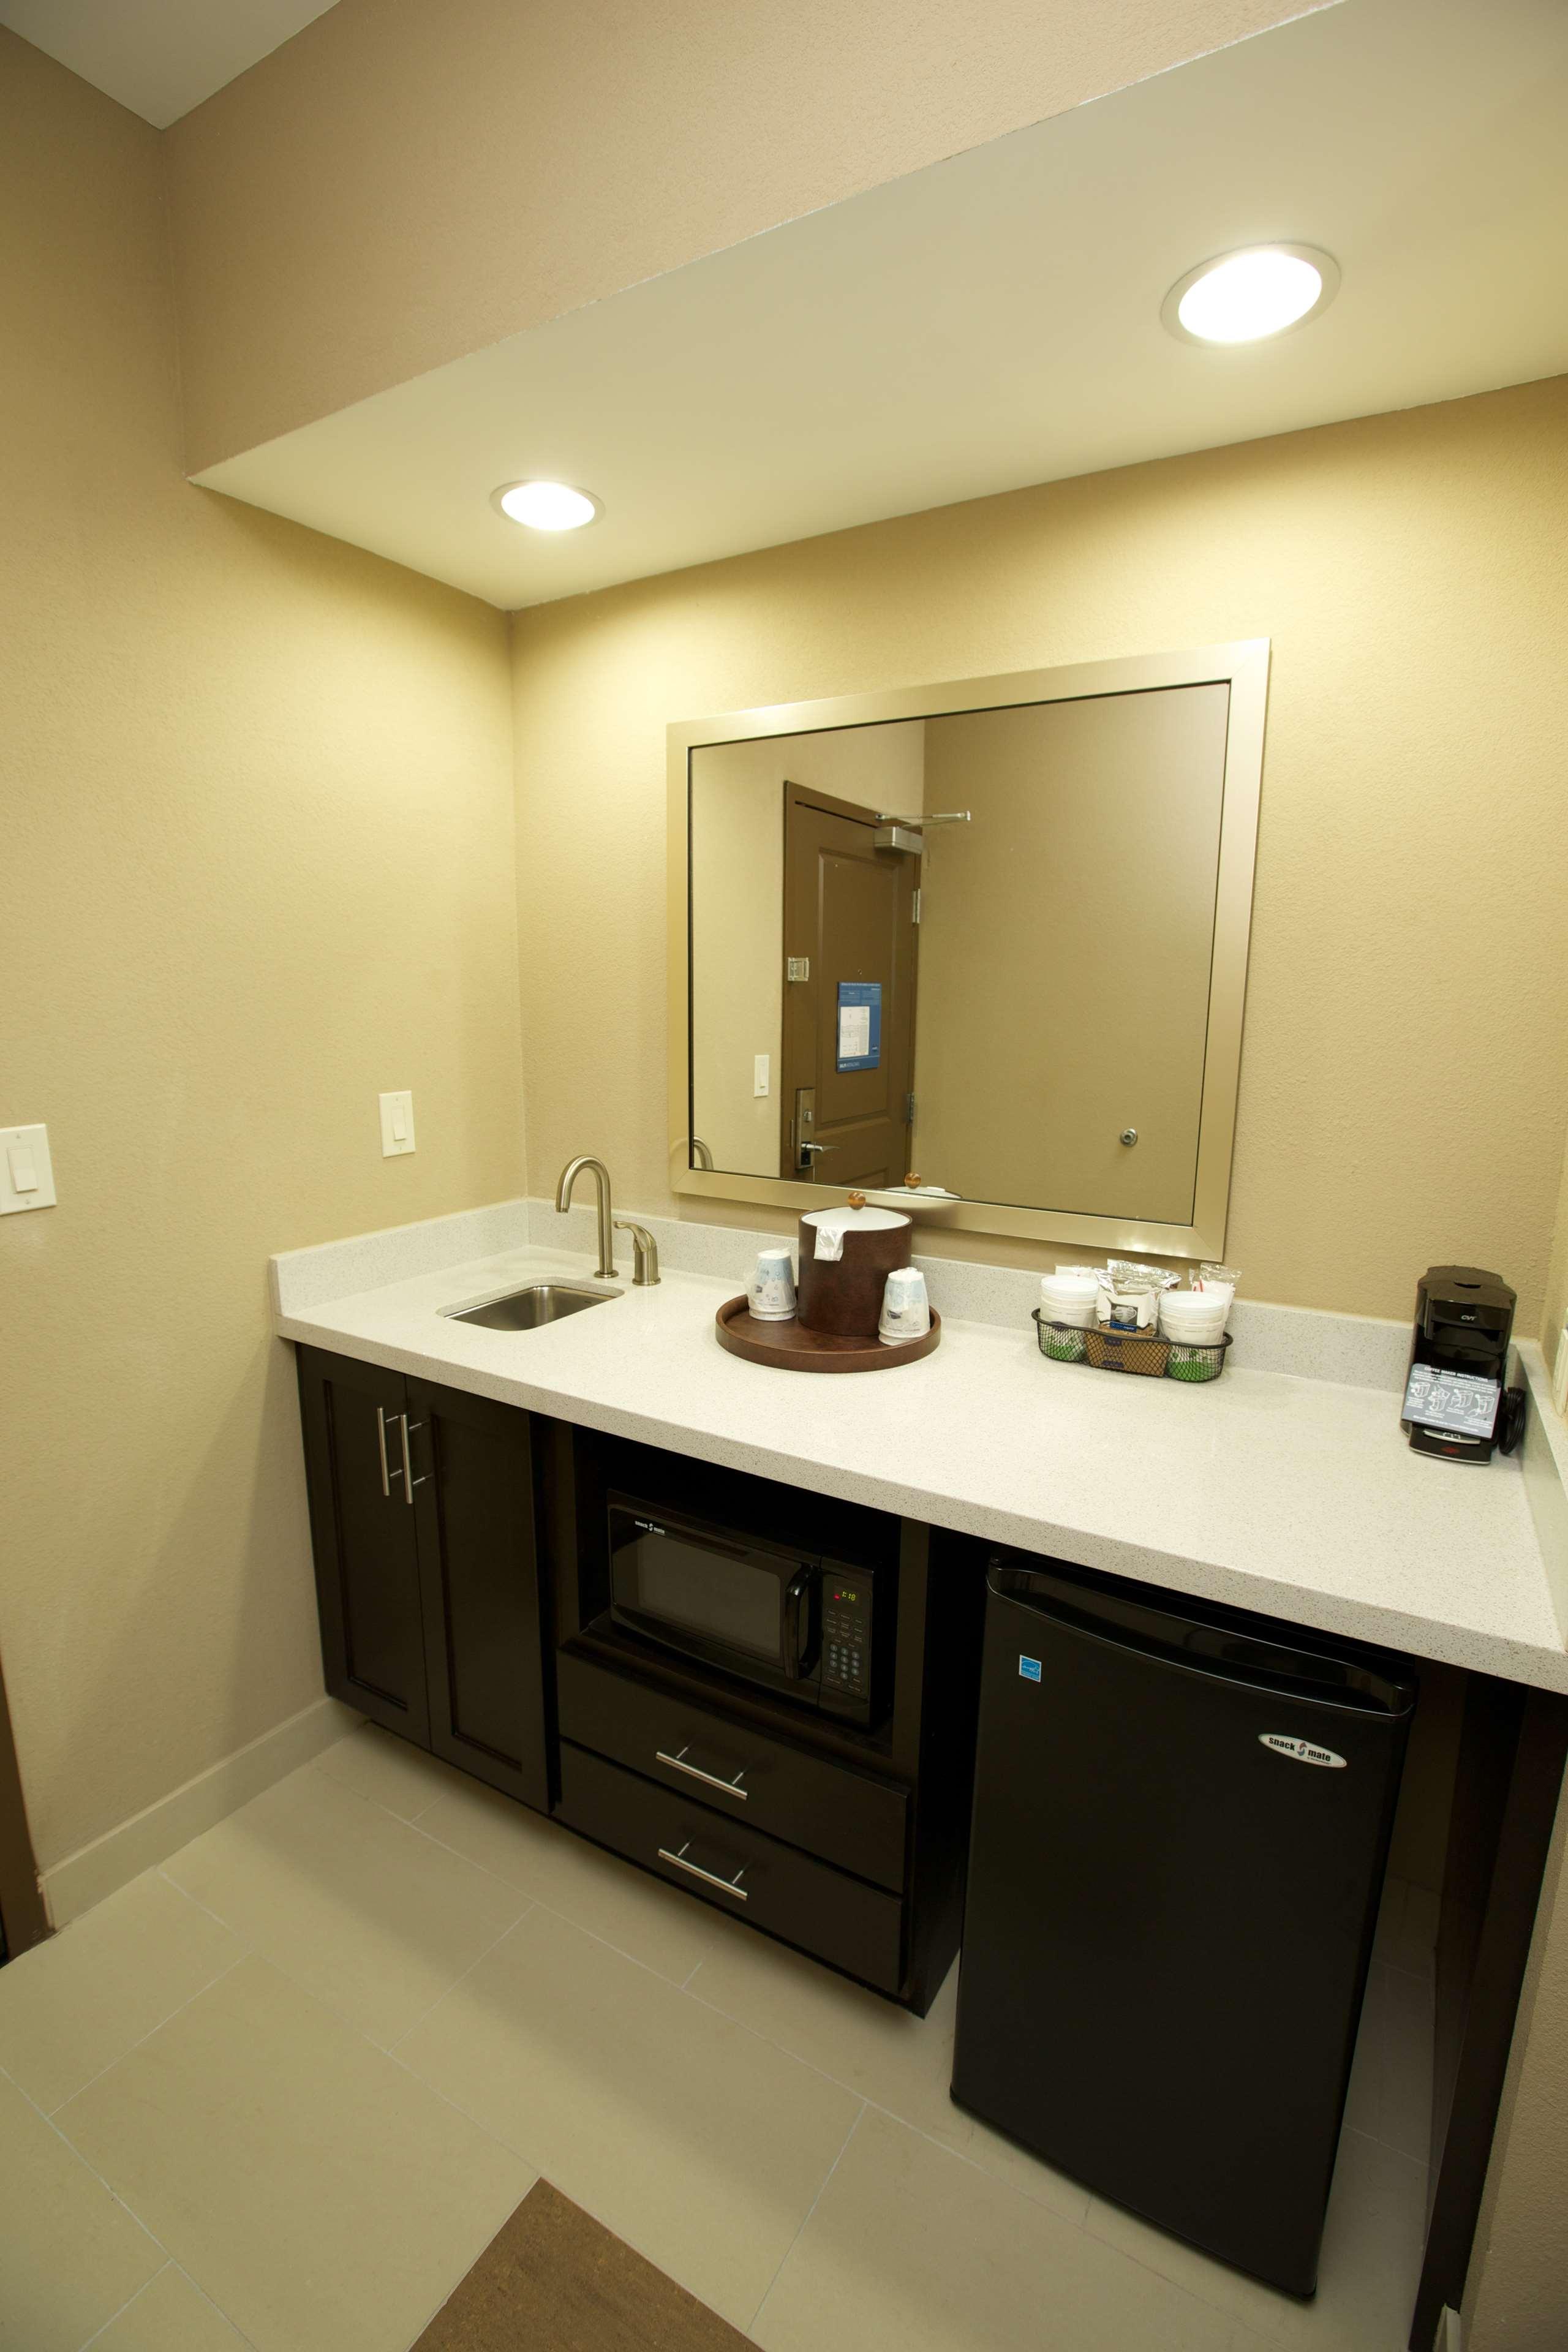 Hampton Inn & Suites Missouri City, TX image 35